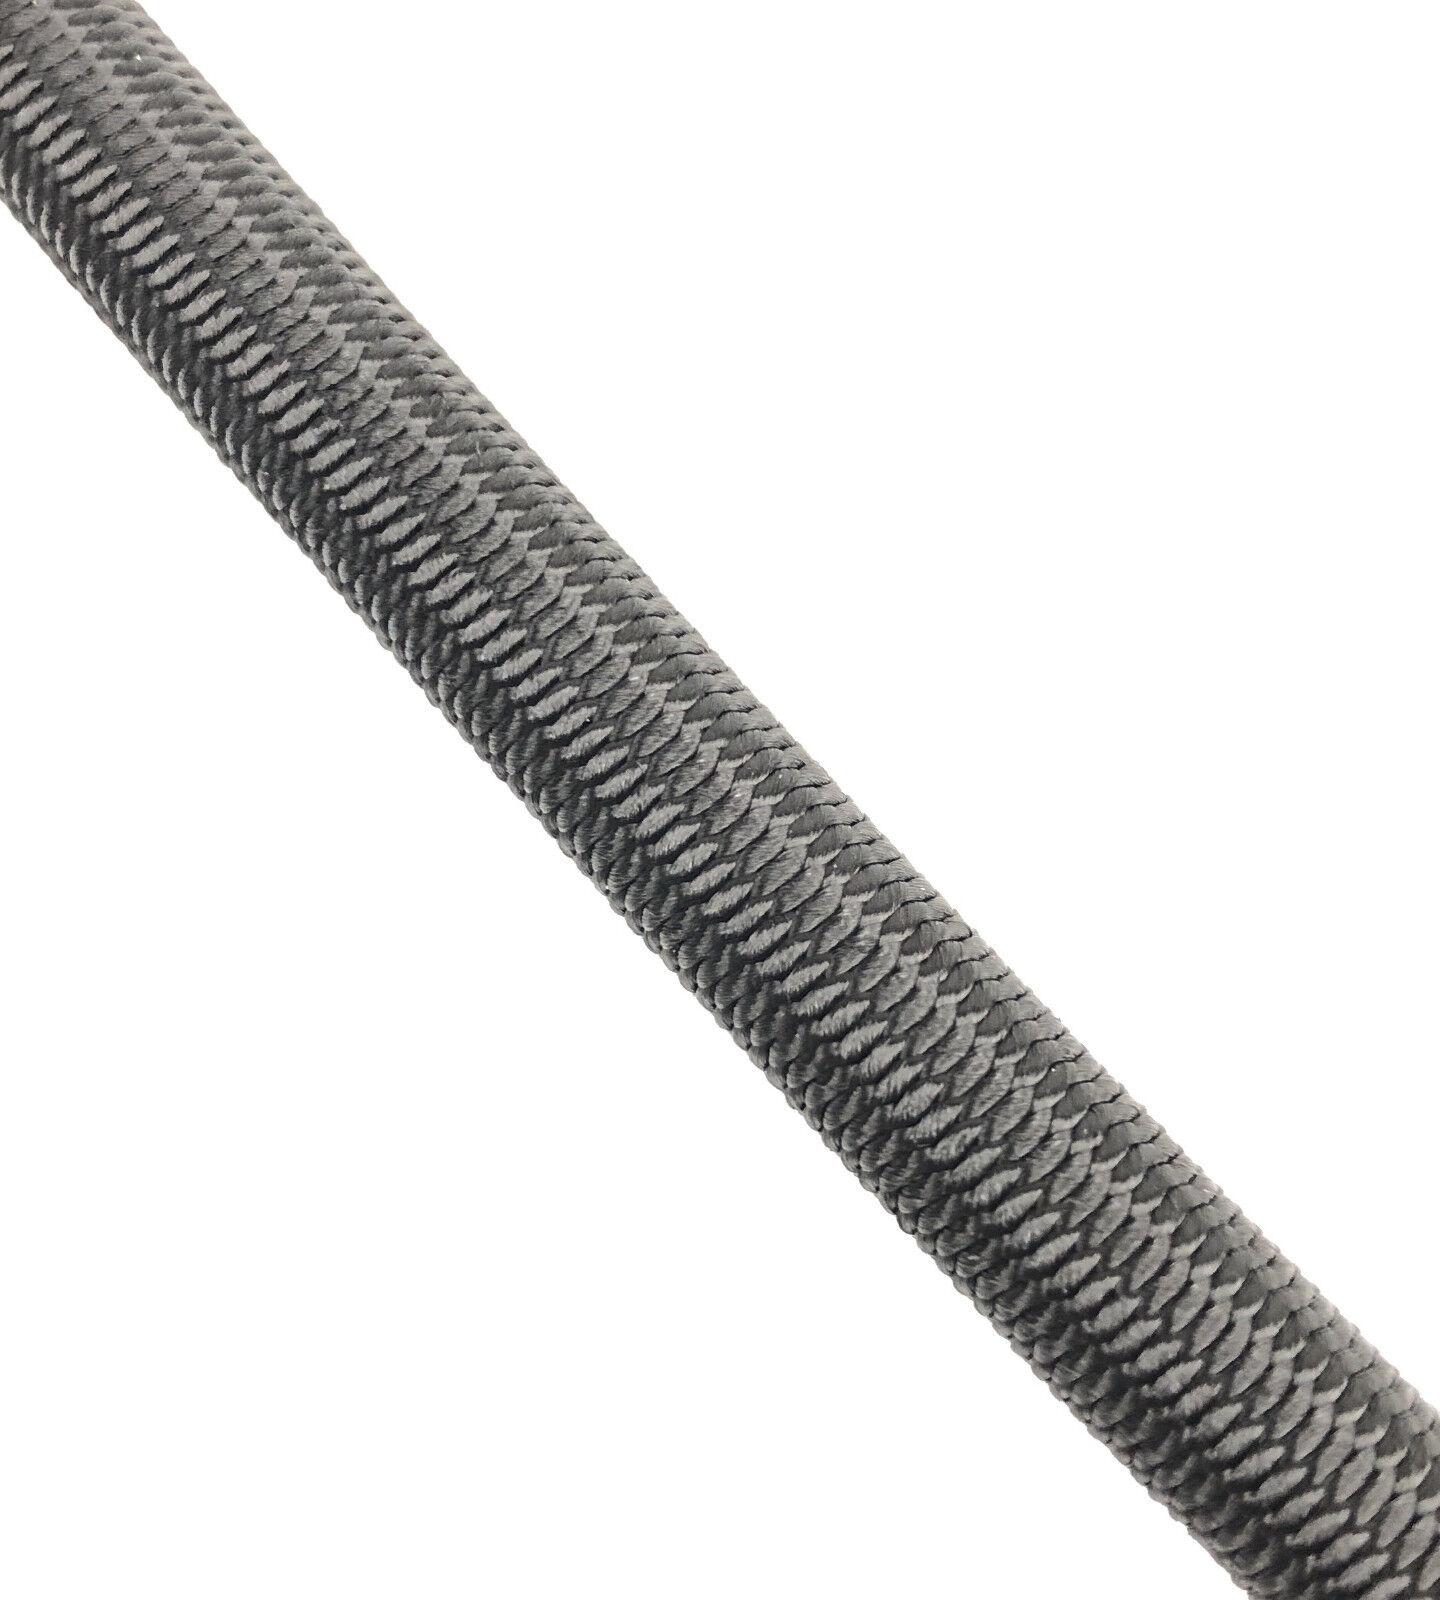 12 elastisch mm schwarz elastisch 12 Gummi seil. Gummiseil Anbindung x 40 M e5307d